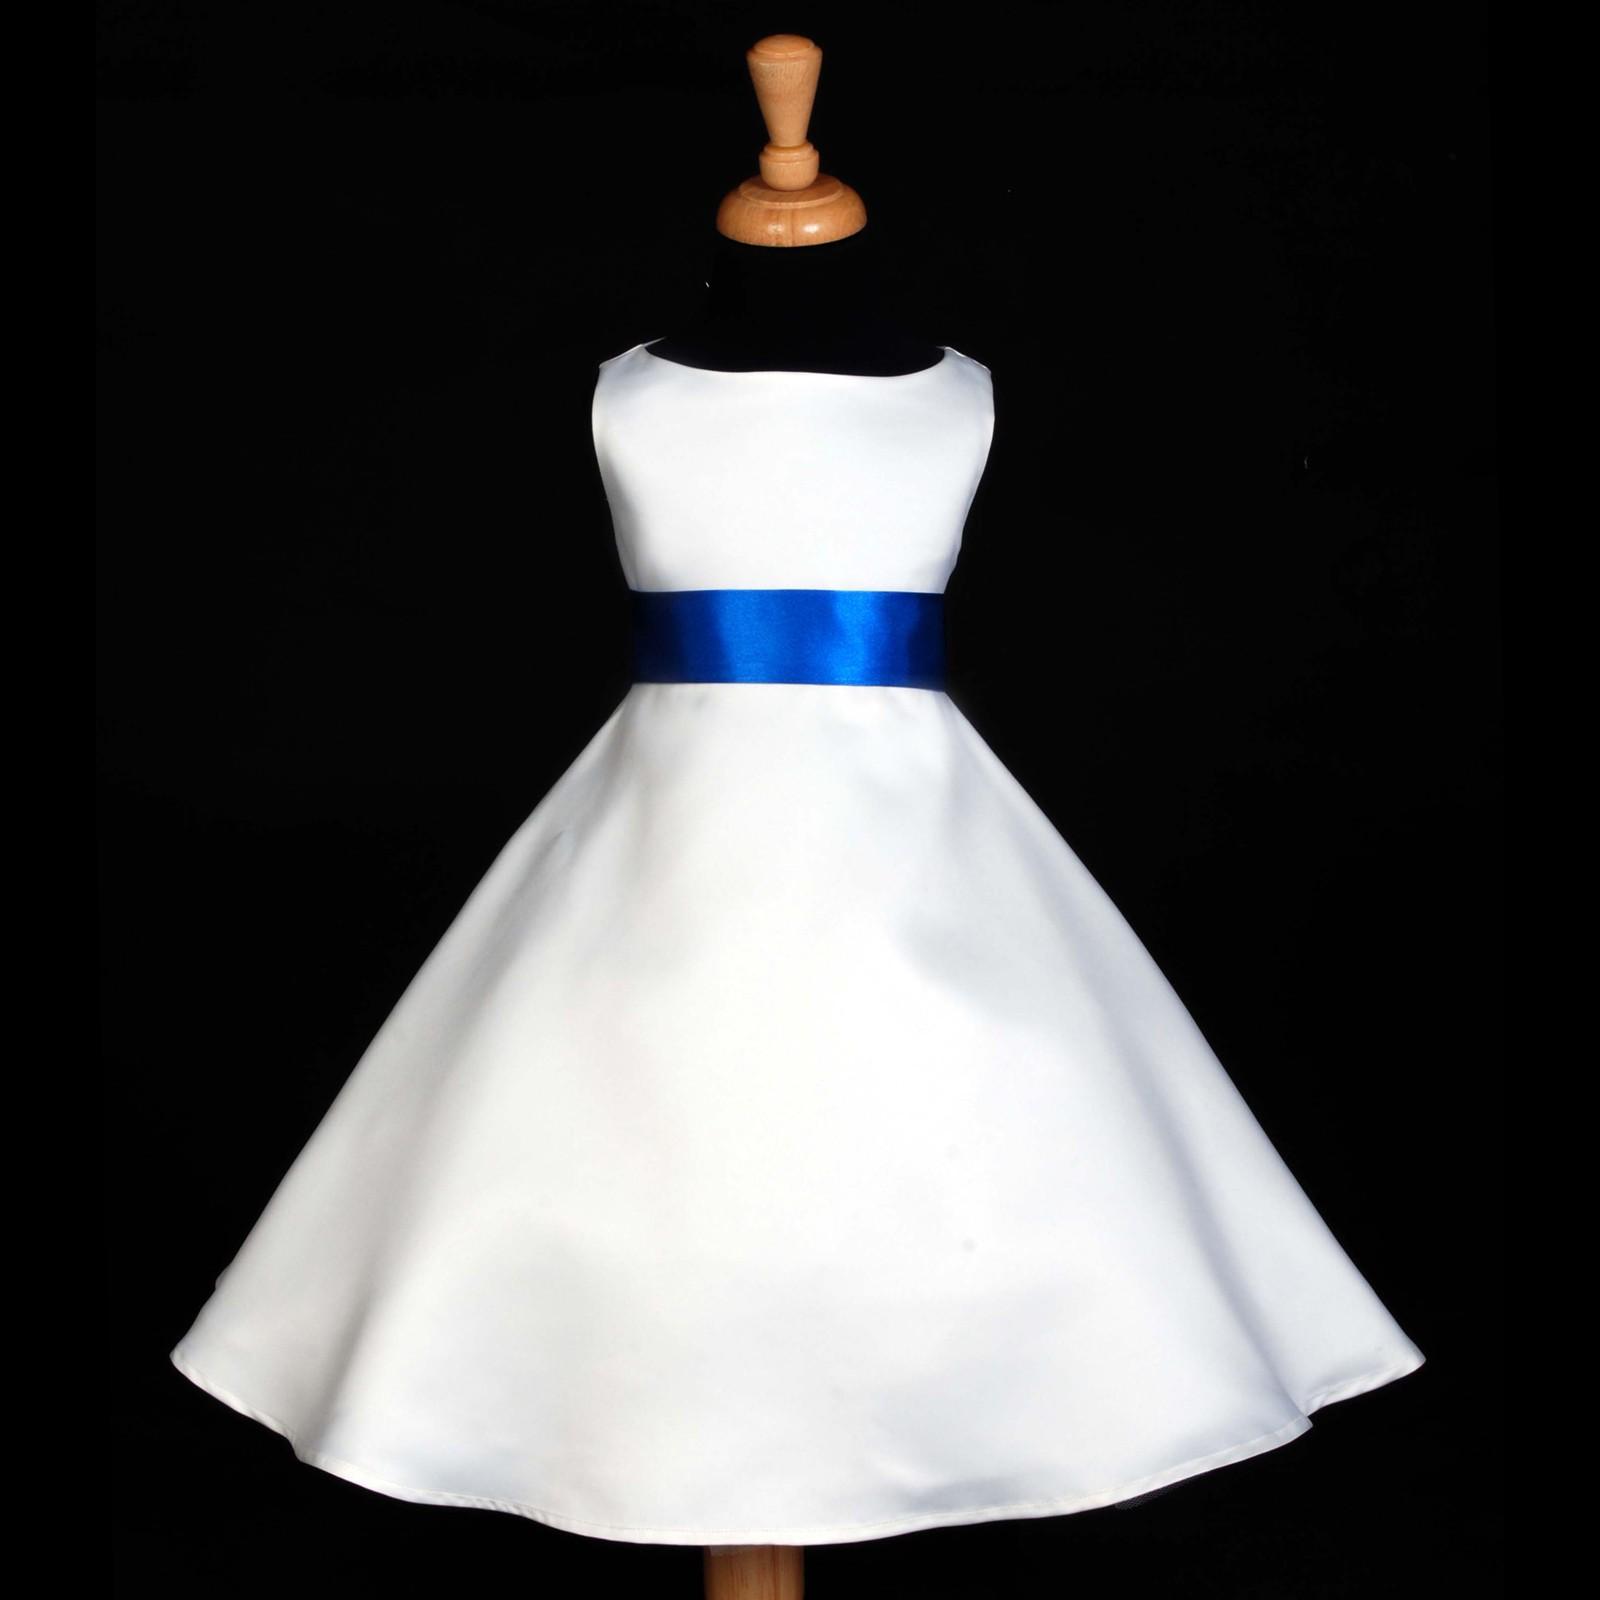 987ca0e10fbf Royal Blue Color Flower Girl Dresses - PostParc